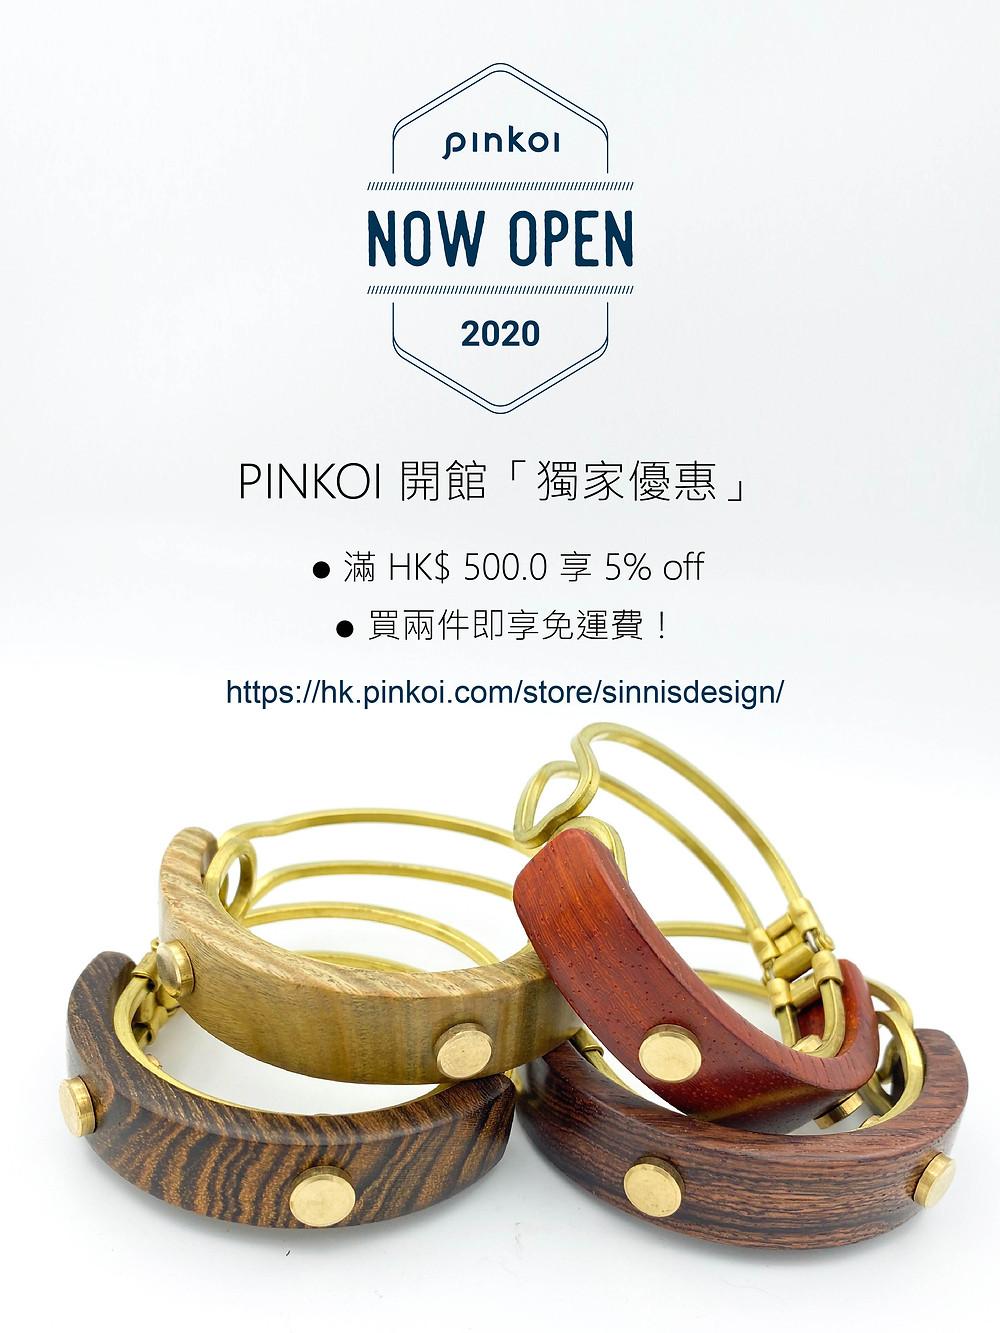 SinniS design Pinkoi grand opening